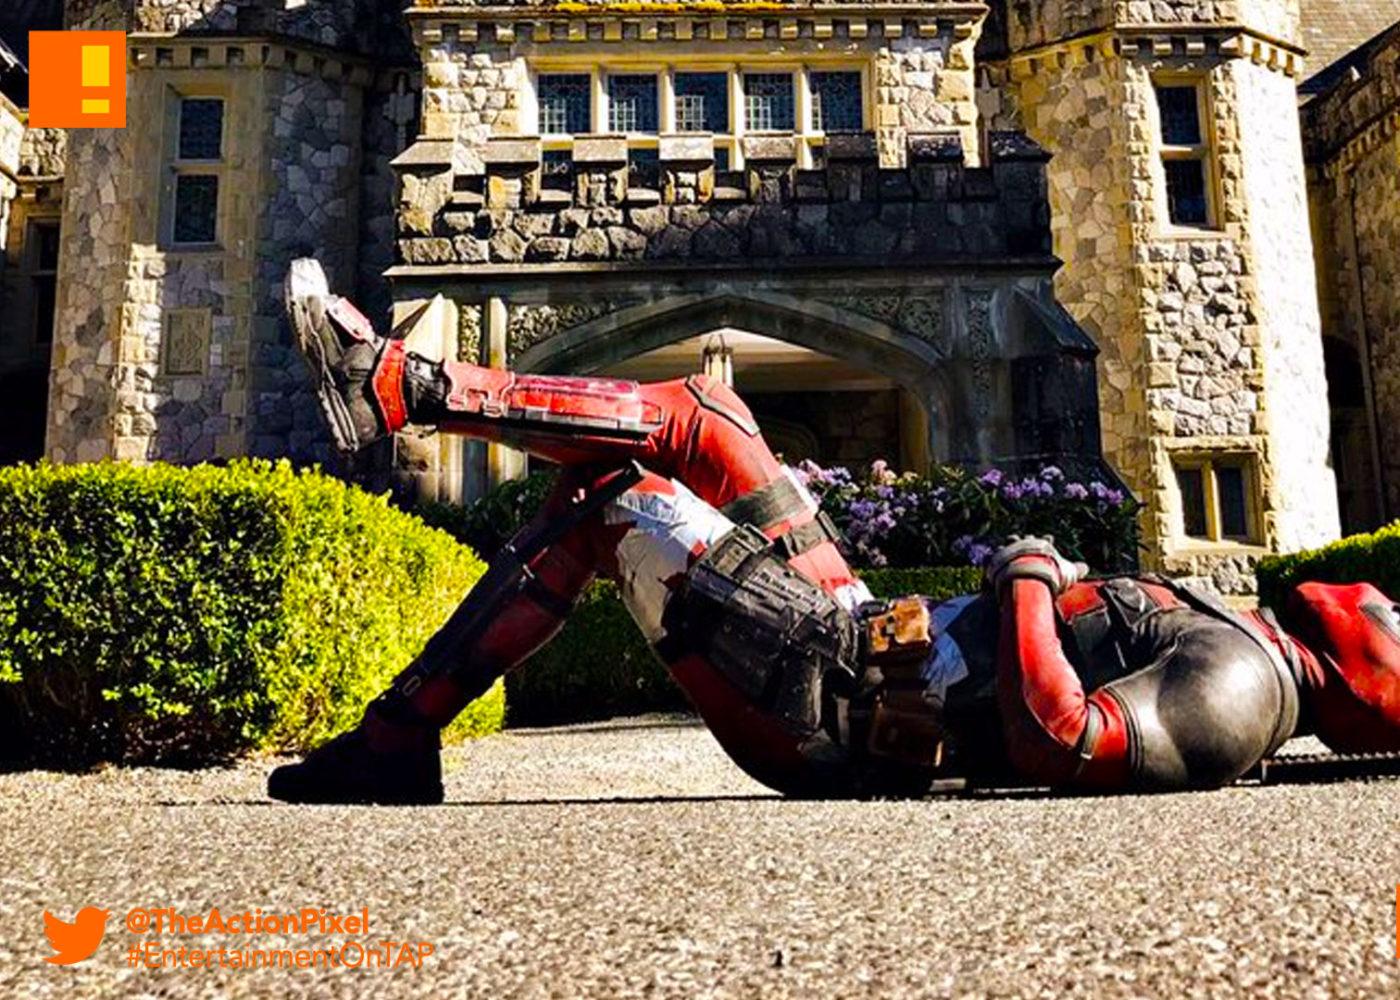 deadpool 2, x mansion, xavier institute, deadpool, marvel, 20th century fox, marvel comics, mutants, mutant, ryan reynolds , bts, set ,image, merc with the mouth, set photo, the action pixel, entertainment on tap